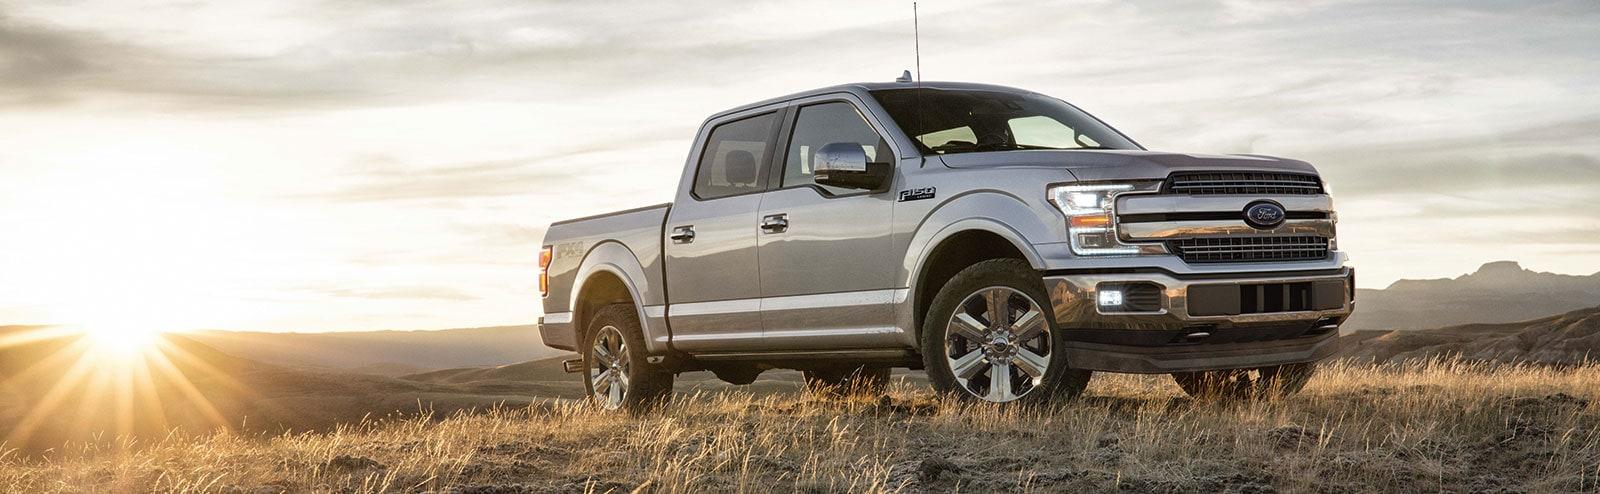 New Ford Truck >> New Ford Trucks In Nederland Tx Philpott Ford